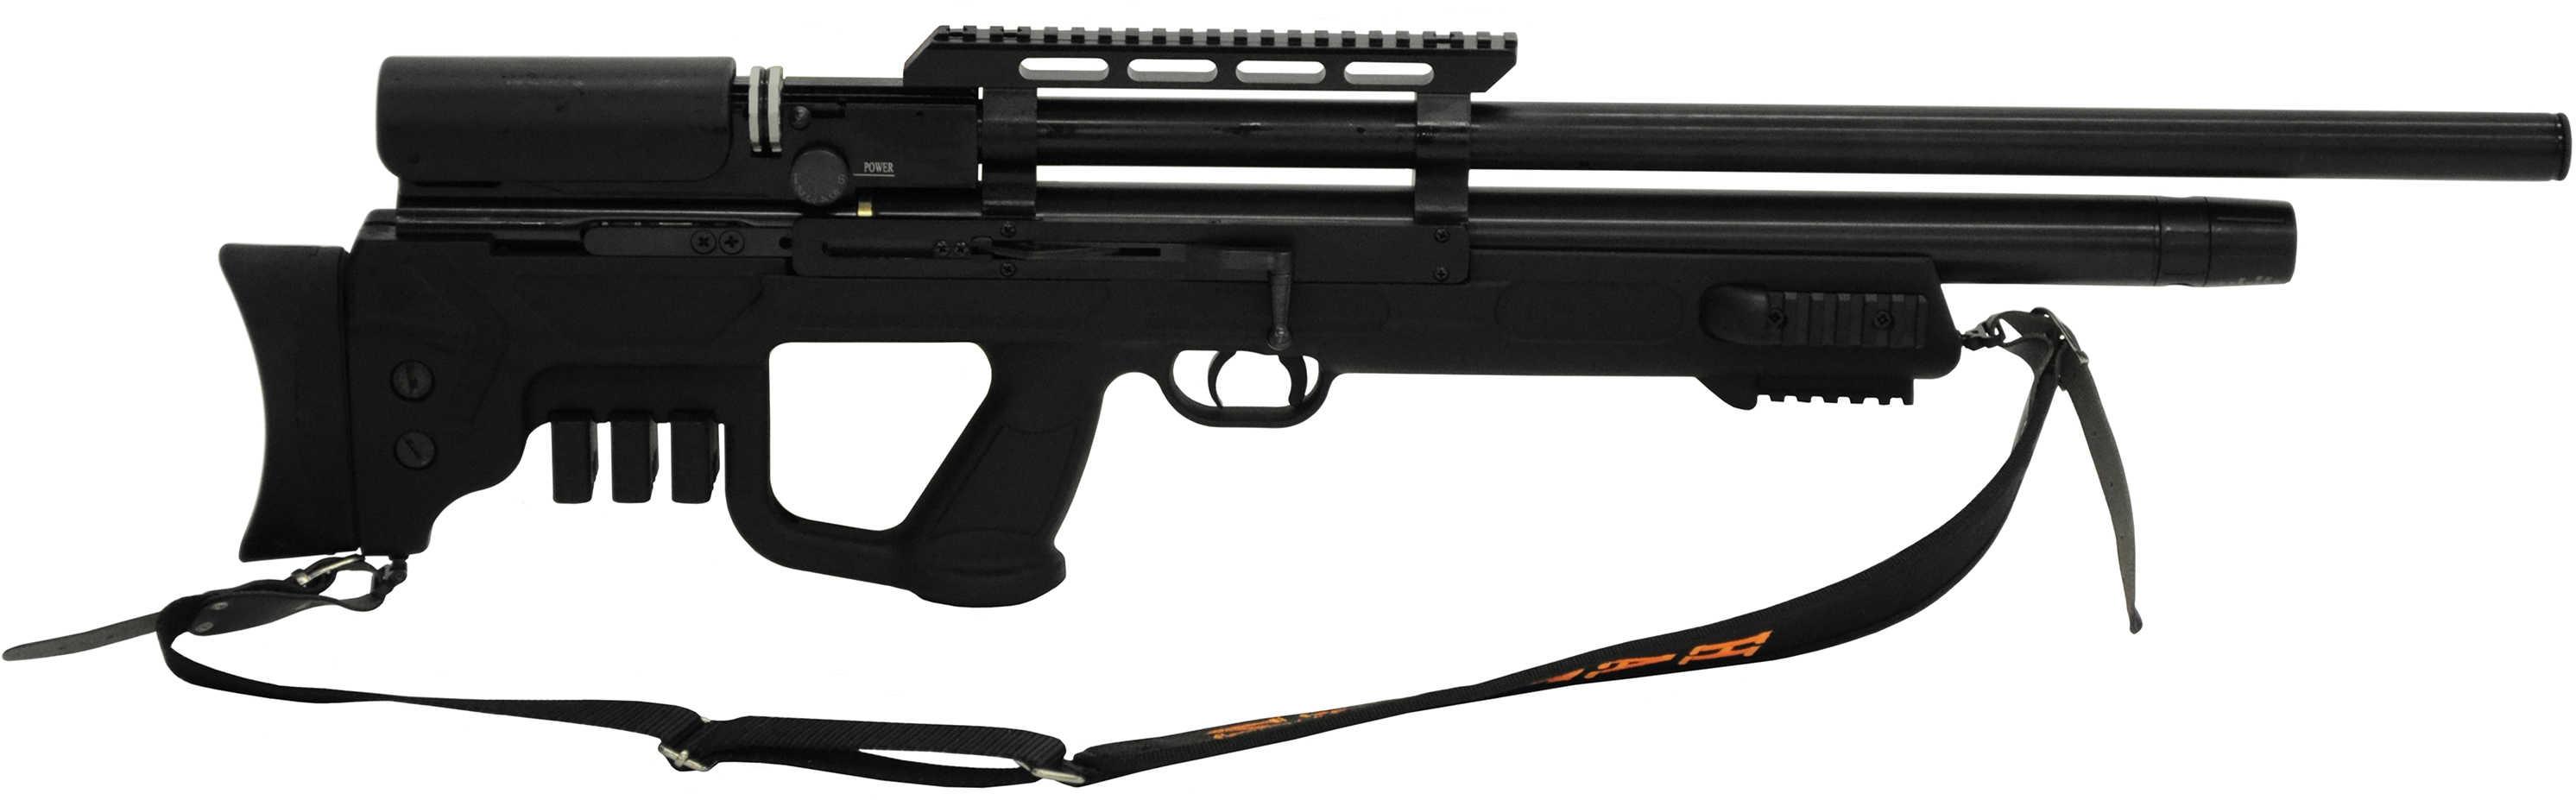 Hatsan USA Hatsan Gladius PCP Air Rifle  25 Caliber, 19 40